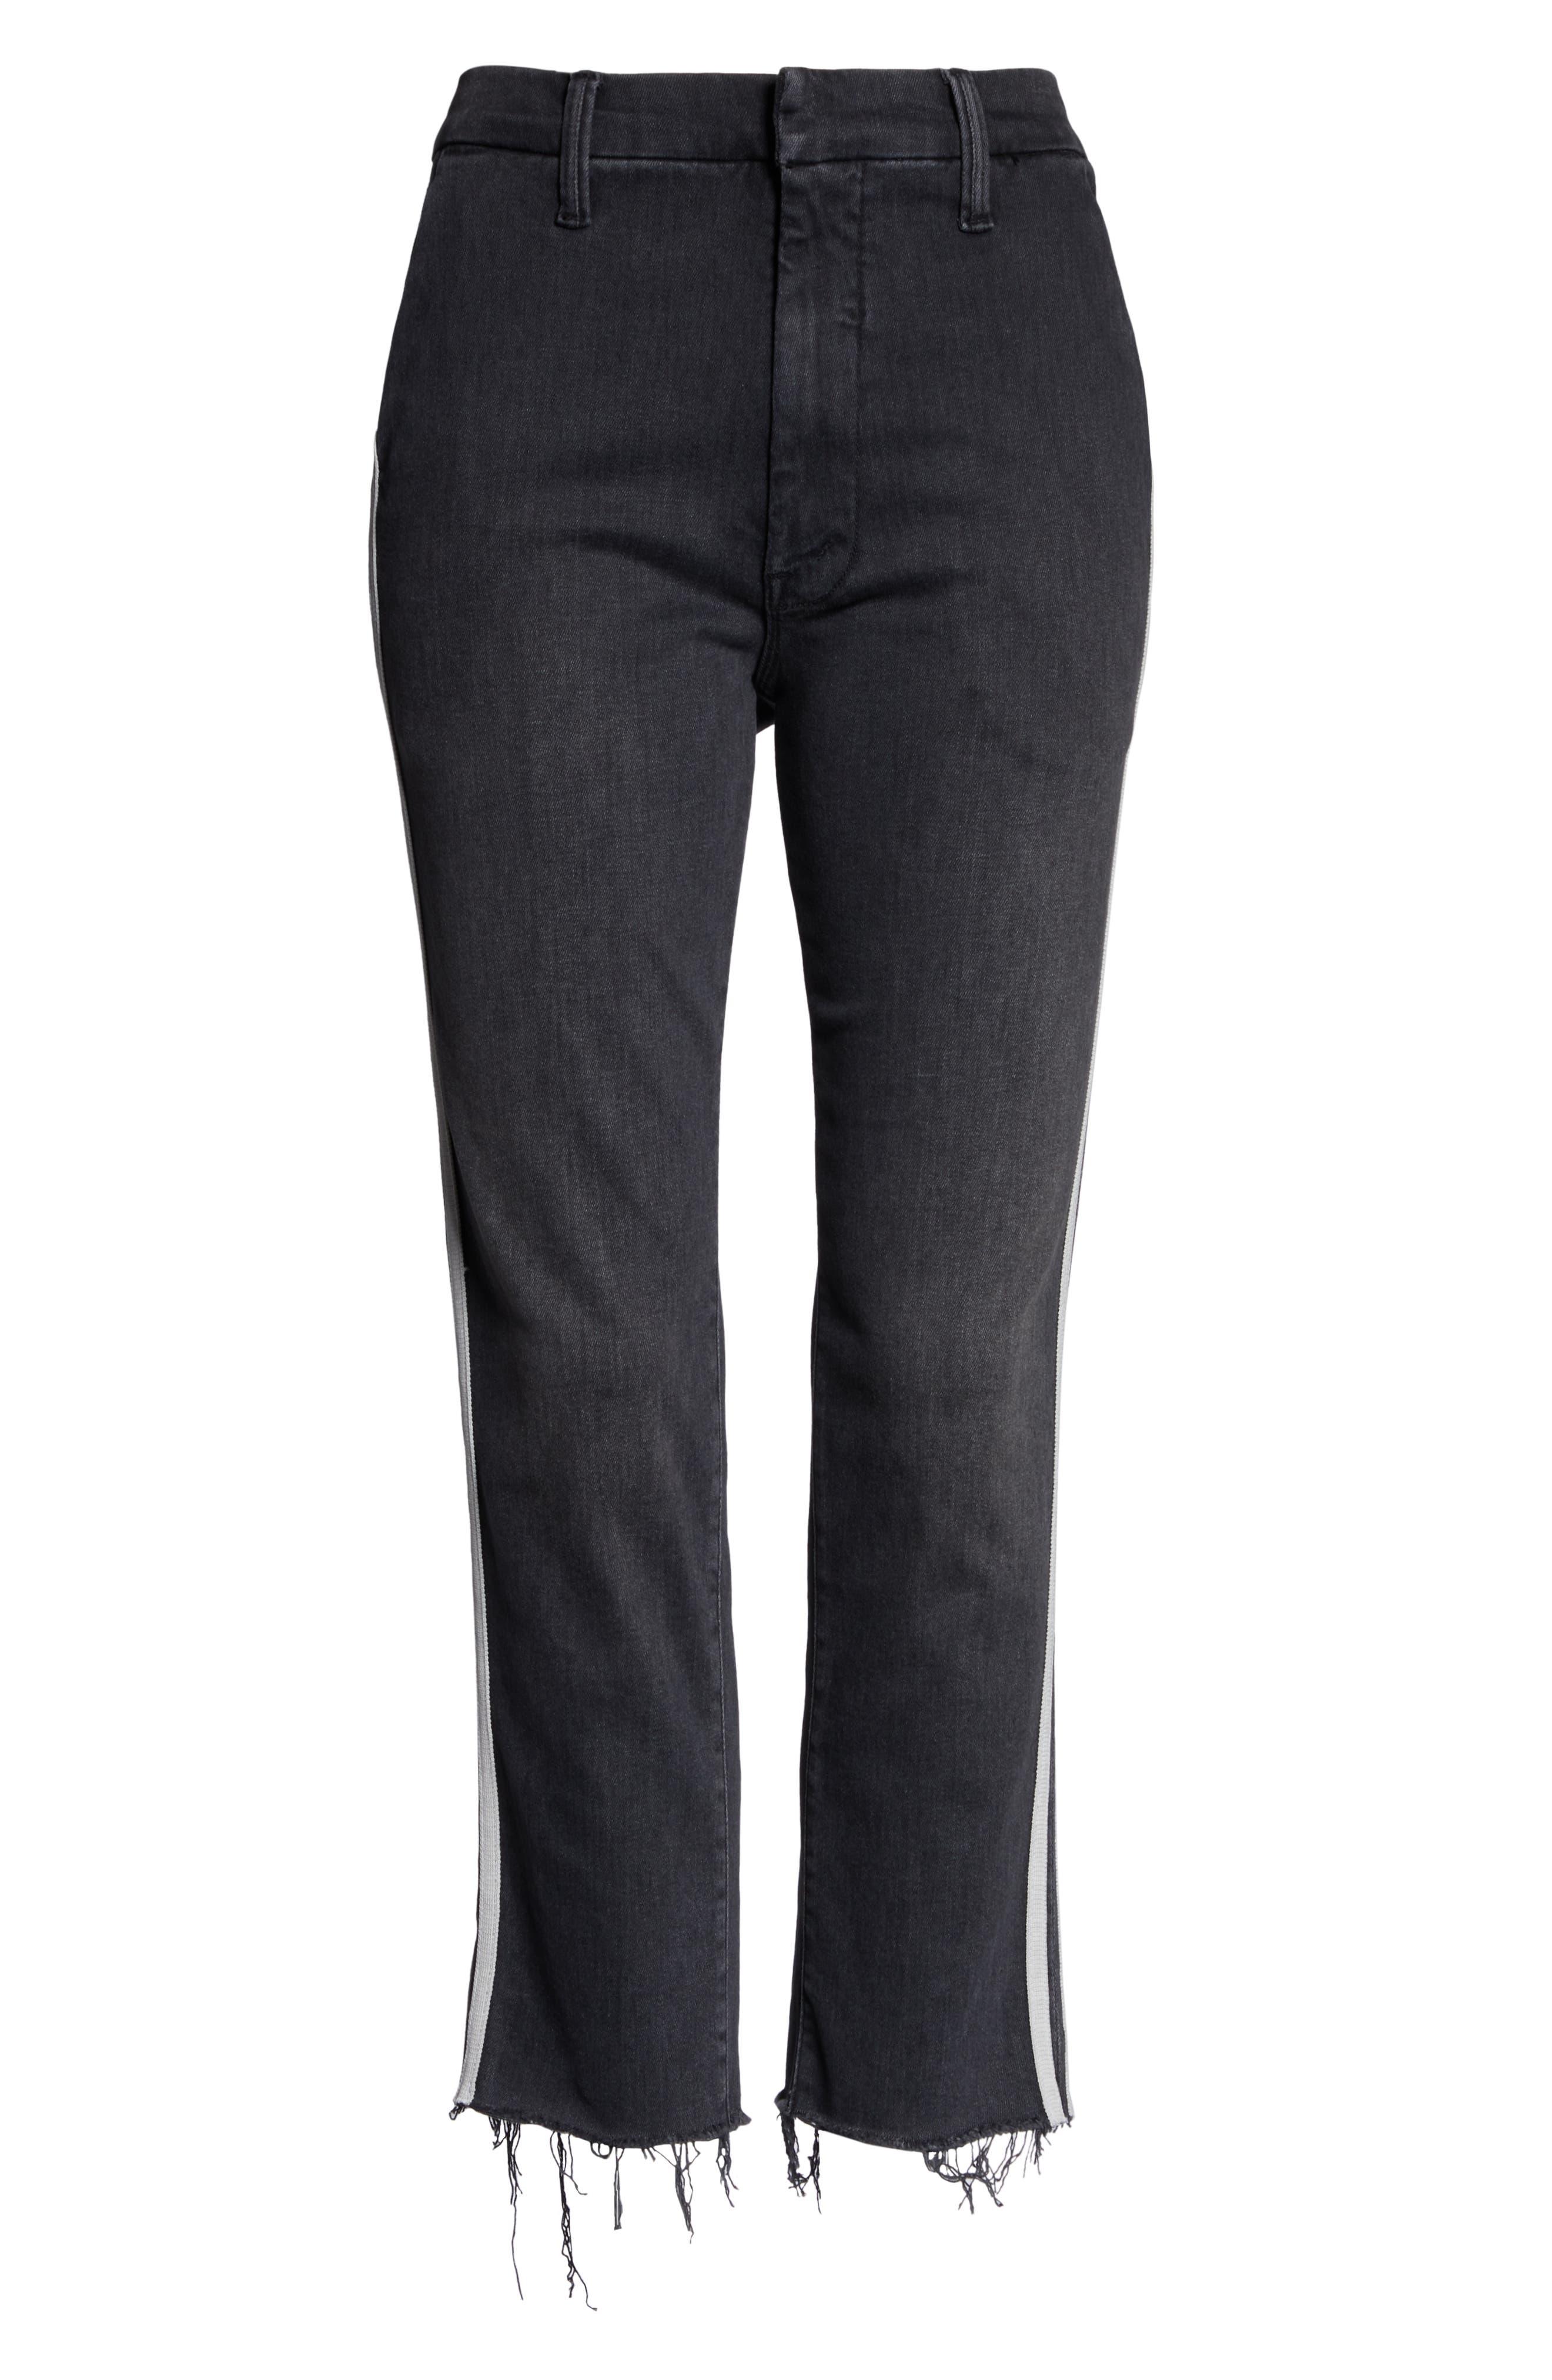 MOTHER, The Shaker Prep High Waist Crop Slim Jeans, Alternate thumbnail 5, color, DEAR MR. BLACK RACER